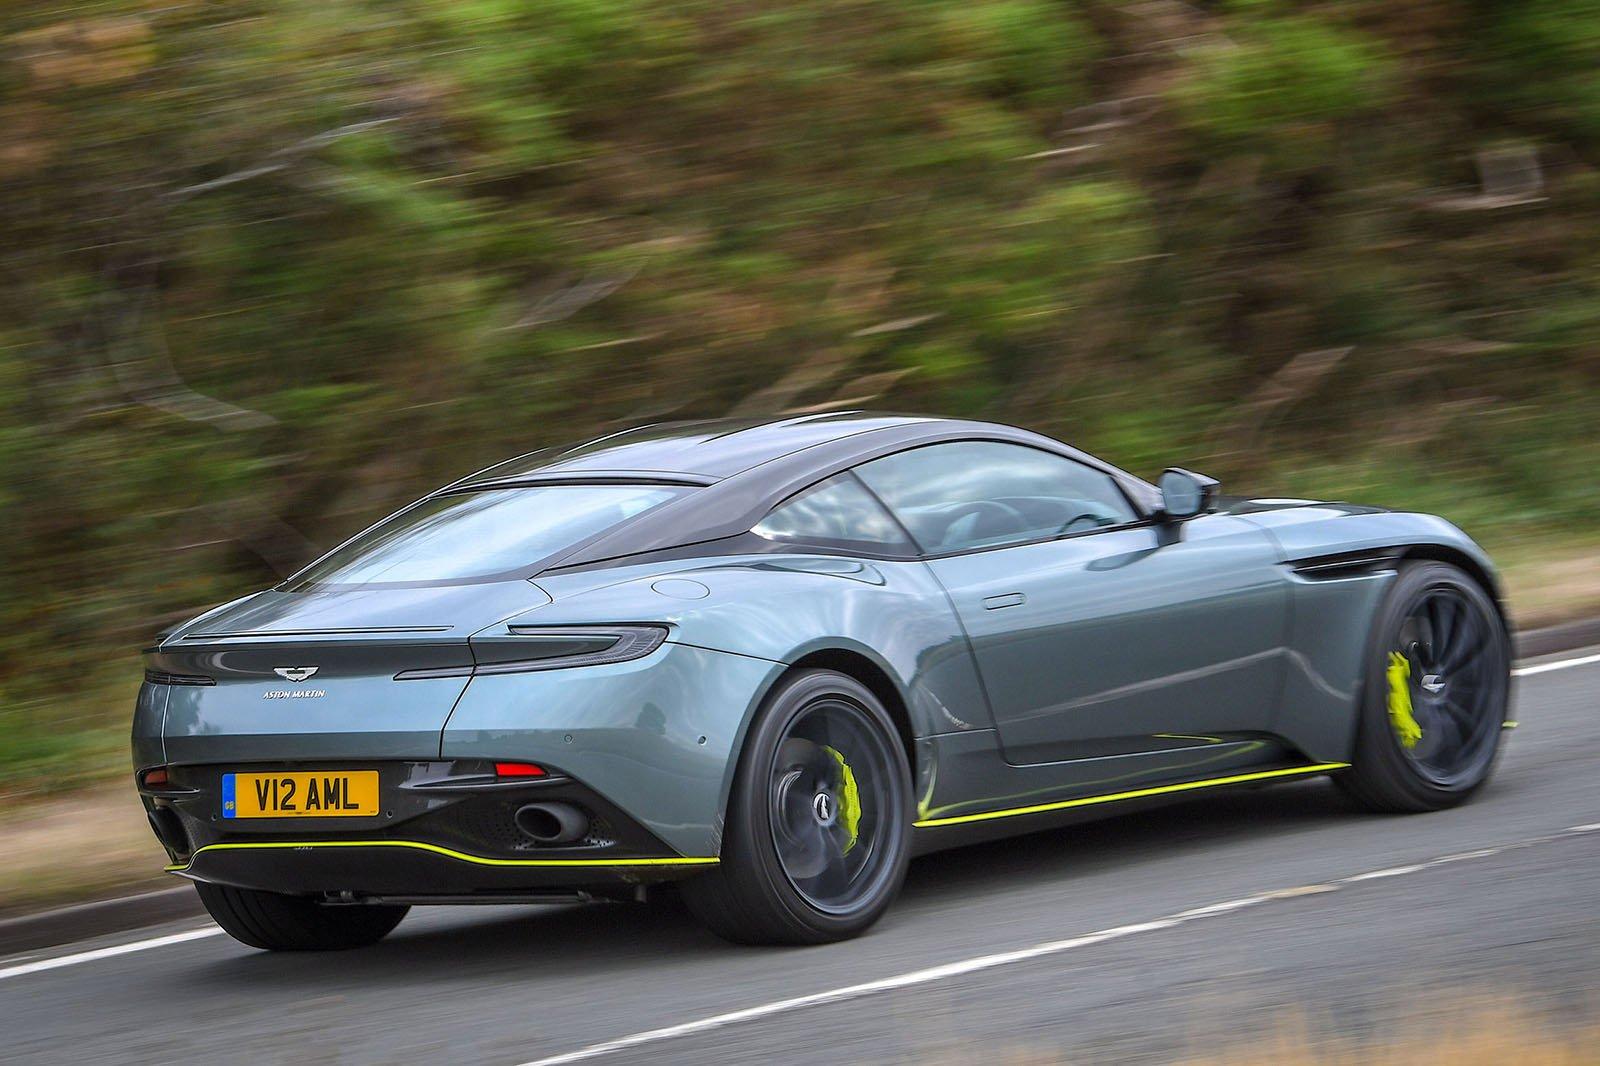 Aston Martin DB11 AMR Rear Tracking